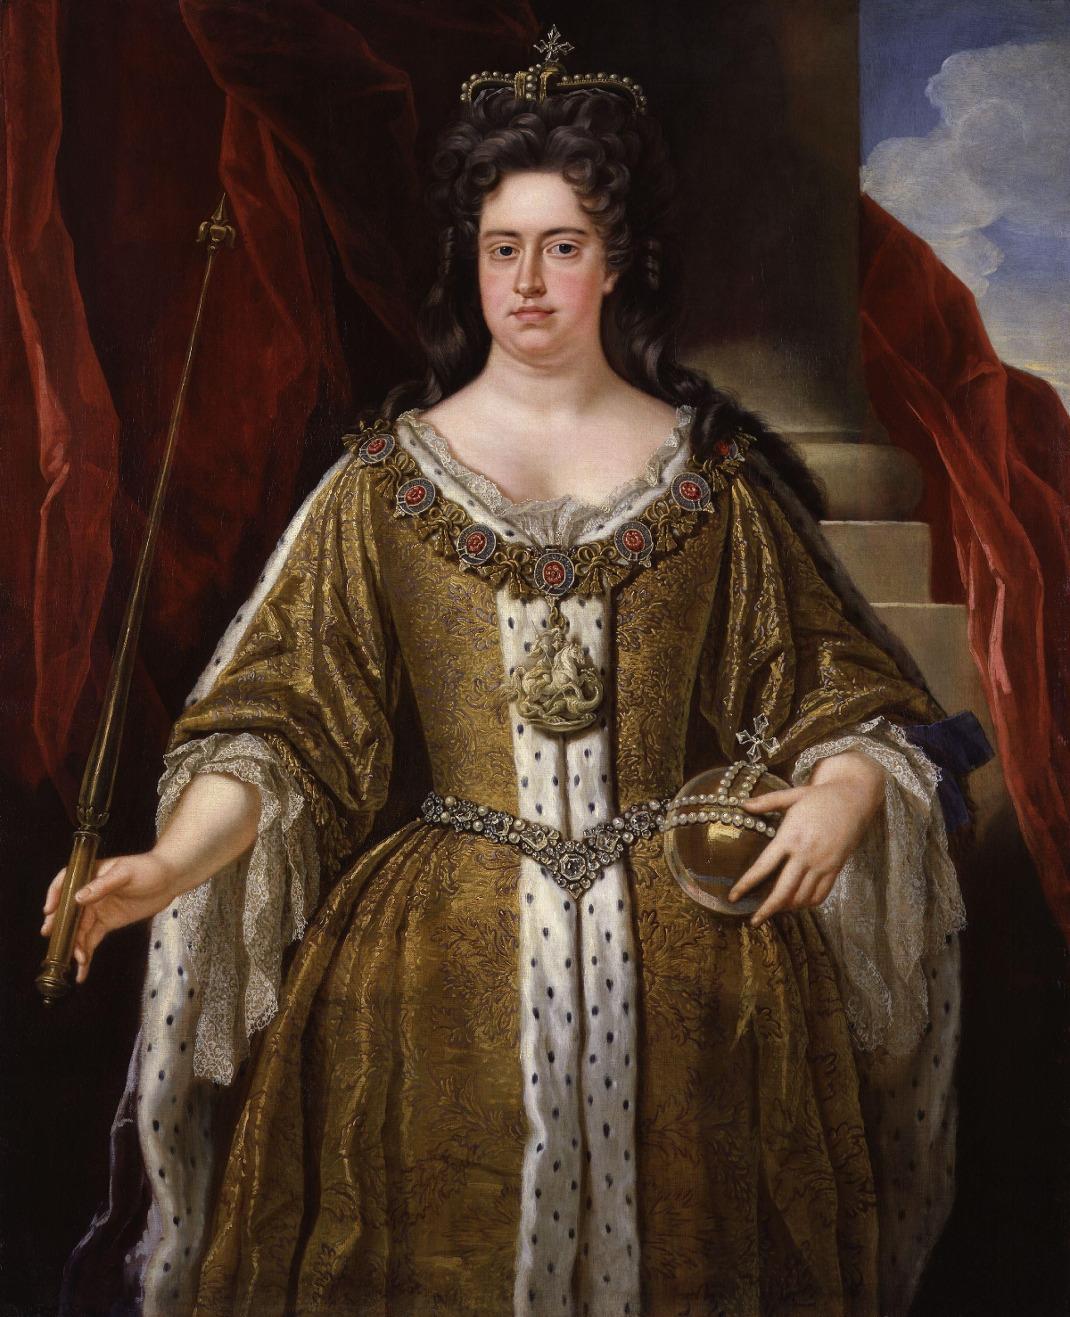 H βασίλισσα Άννα, πορτρέτο του John Closterman, 1702/ Φωτογραφία: WIkipedia